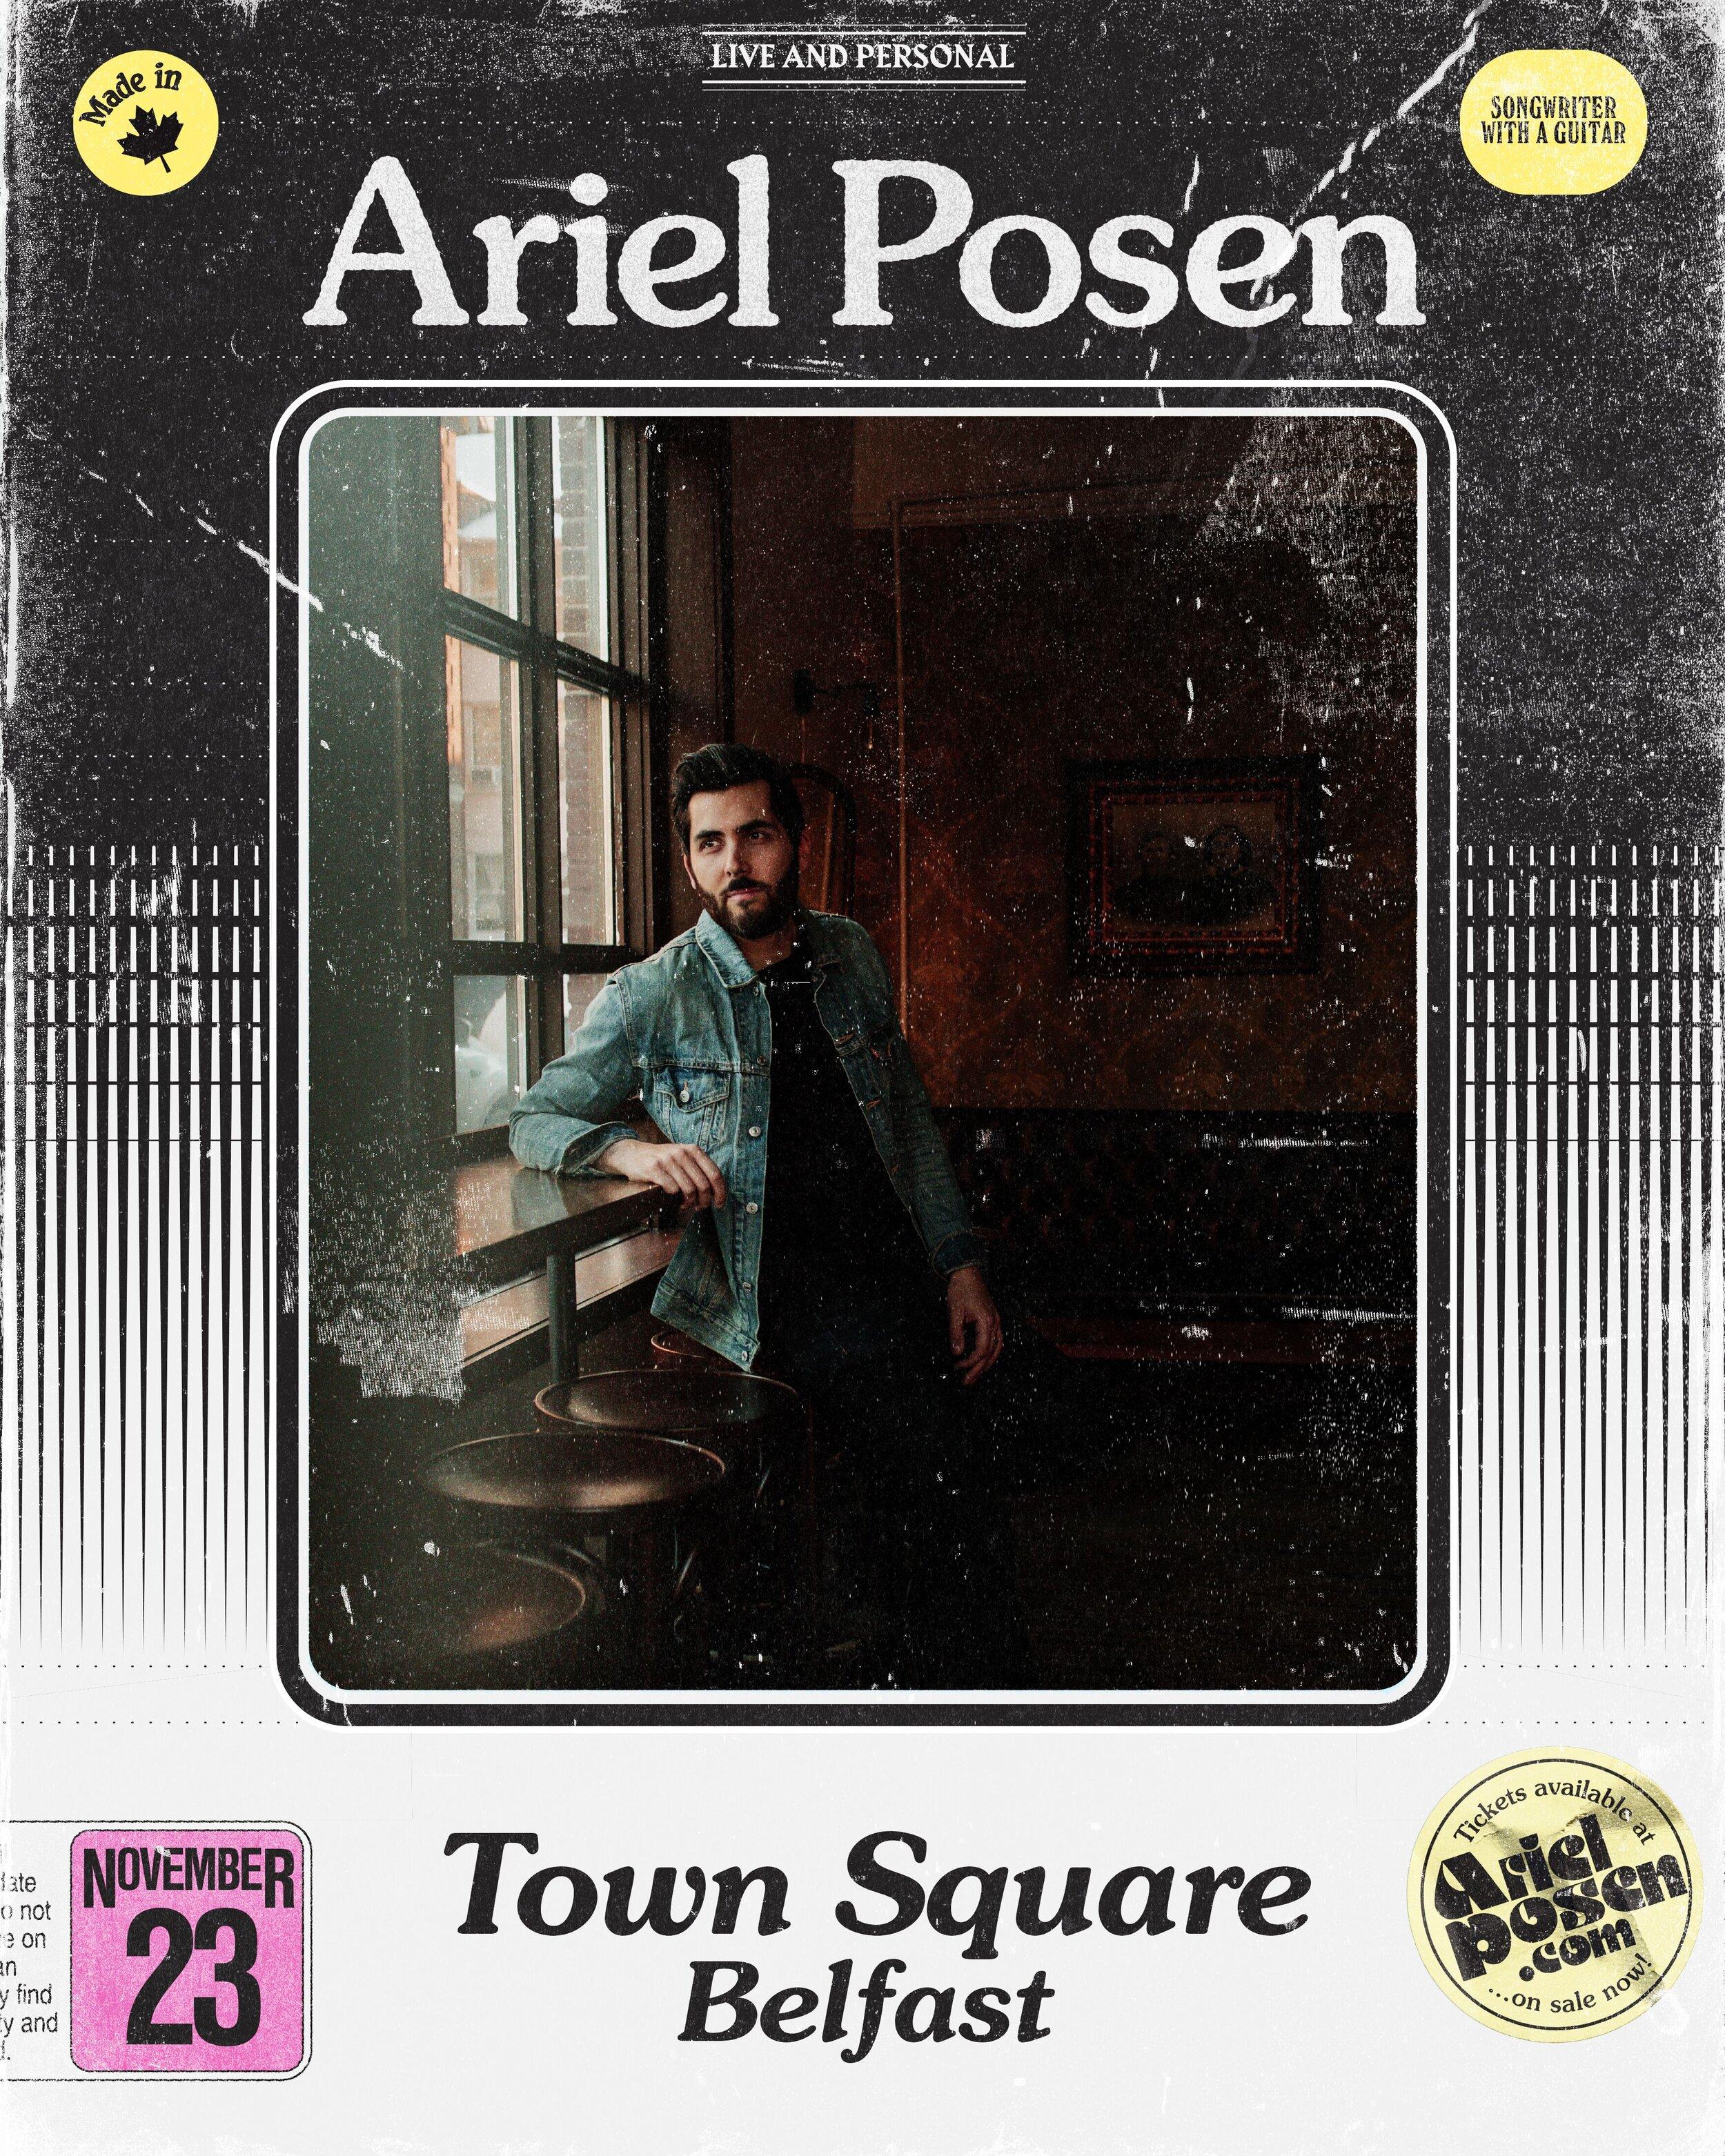 Ariel Posen+Live Music+Events+Cafe+Bar+Cocktails